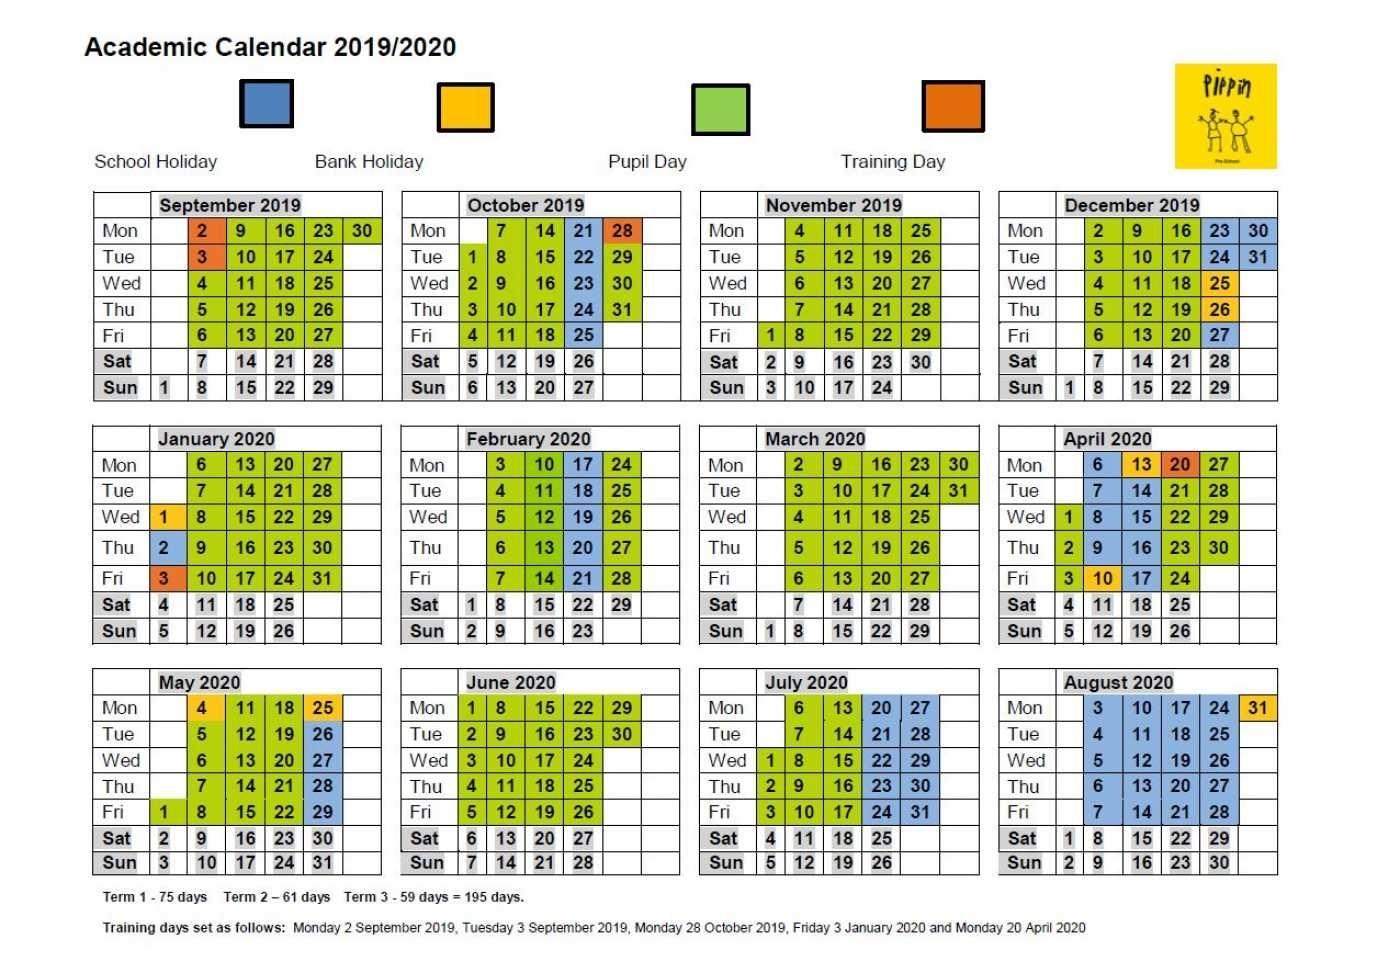 Academic Calendar - Pippin Pre-School intended for Special Days Calendar 2019-2020